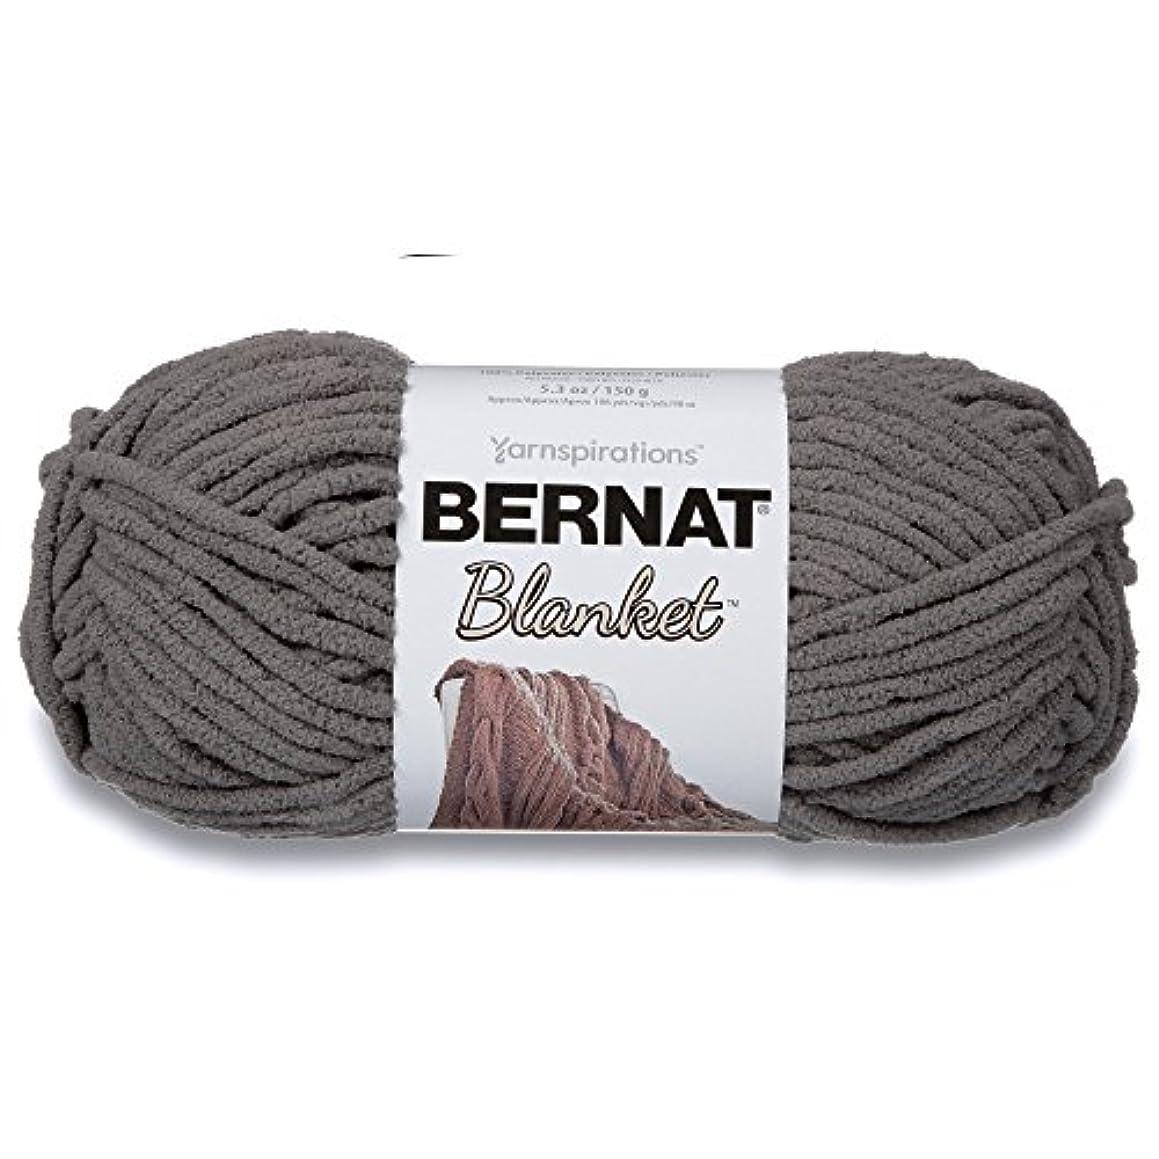 Bernat Blanket Super Bulky Yarn, 5.3oz, Guage 6 Super Bulky, Dark Grey